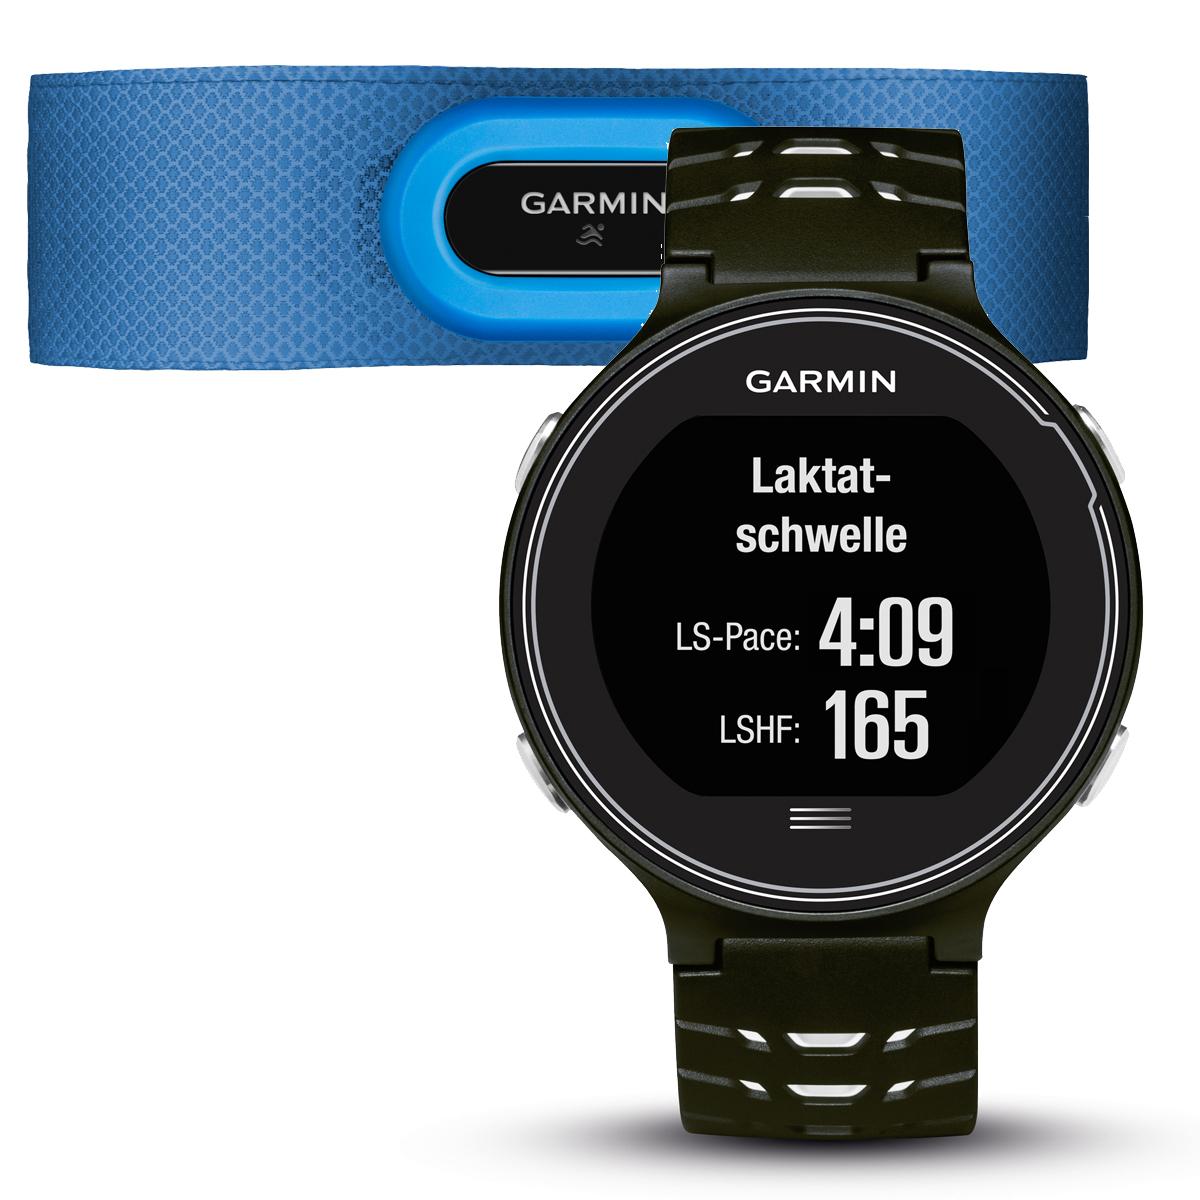 Спортивные часы Garmin Forerunner 630 HRM, цвет: черный. 010-03717-30